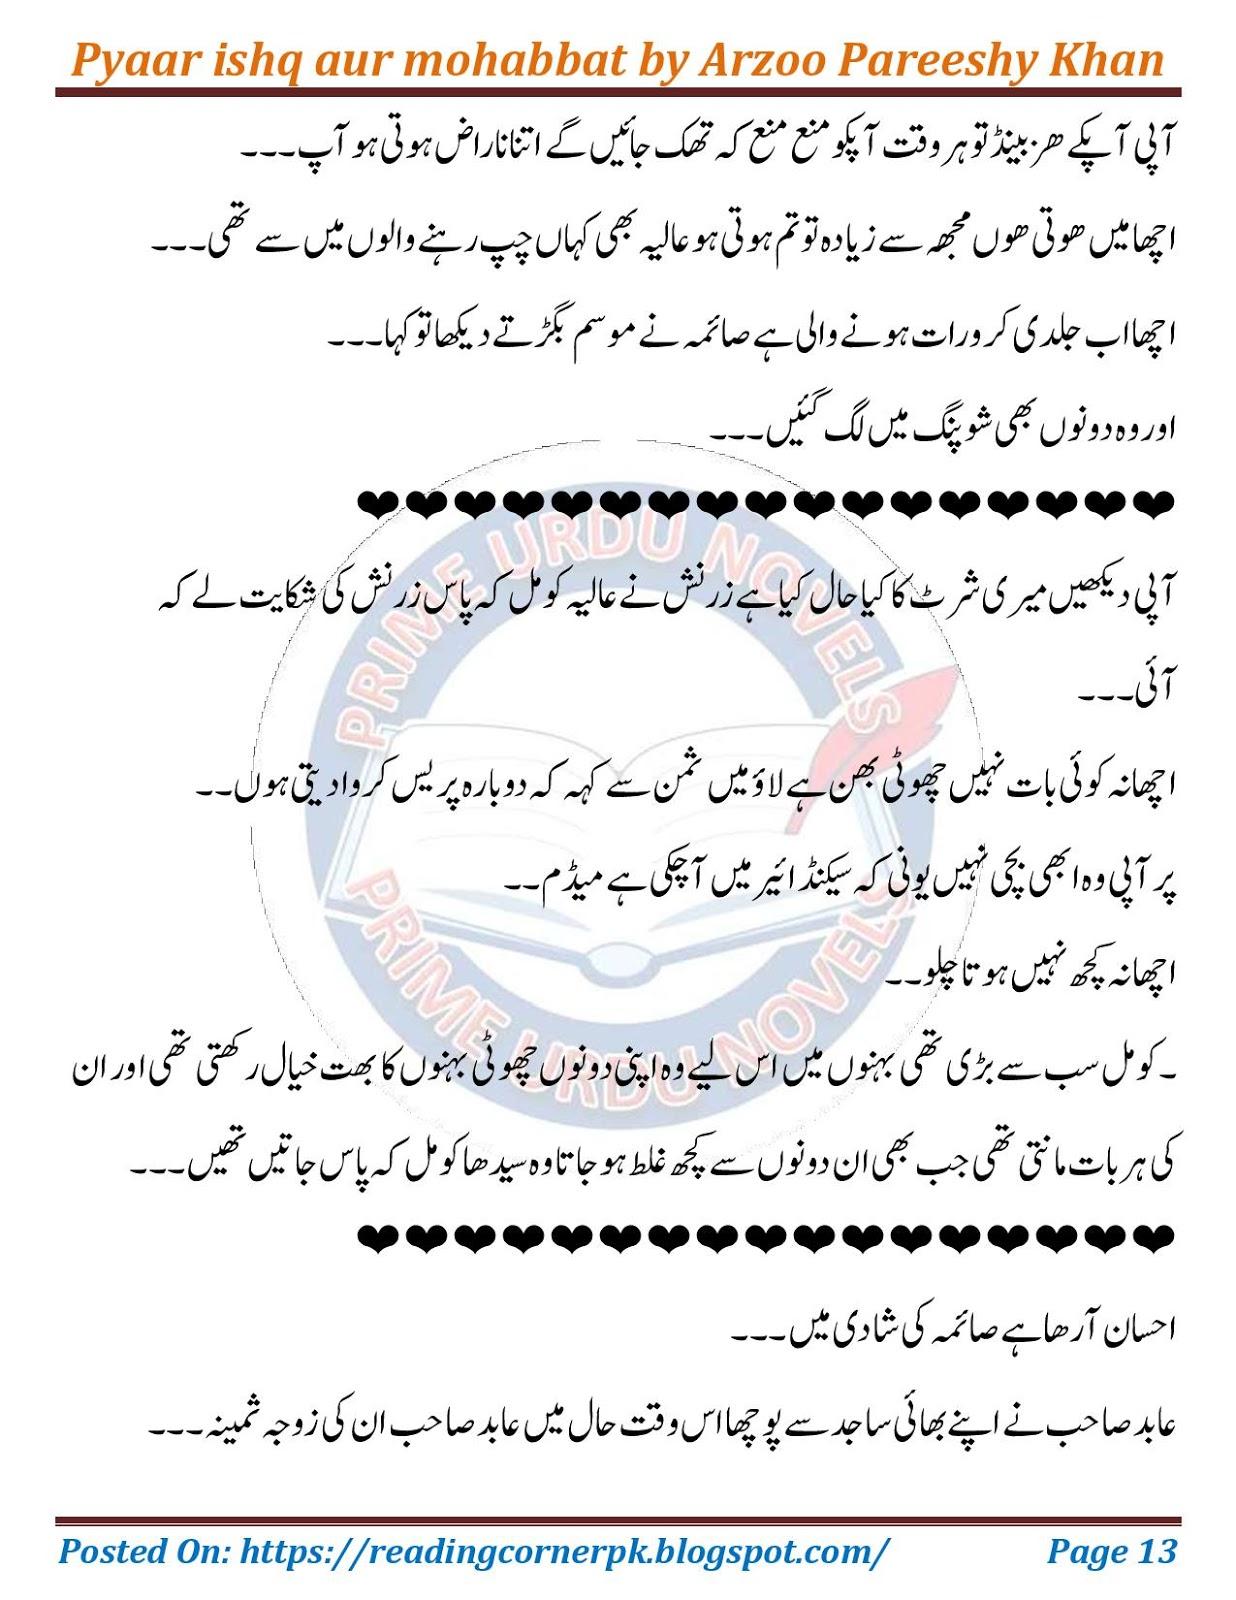 Pyar Ishq Aur Mohabbat By Arzu Pareeshy Khan Complete Urdu